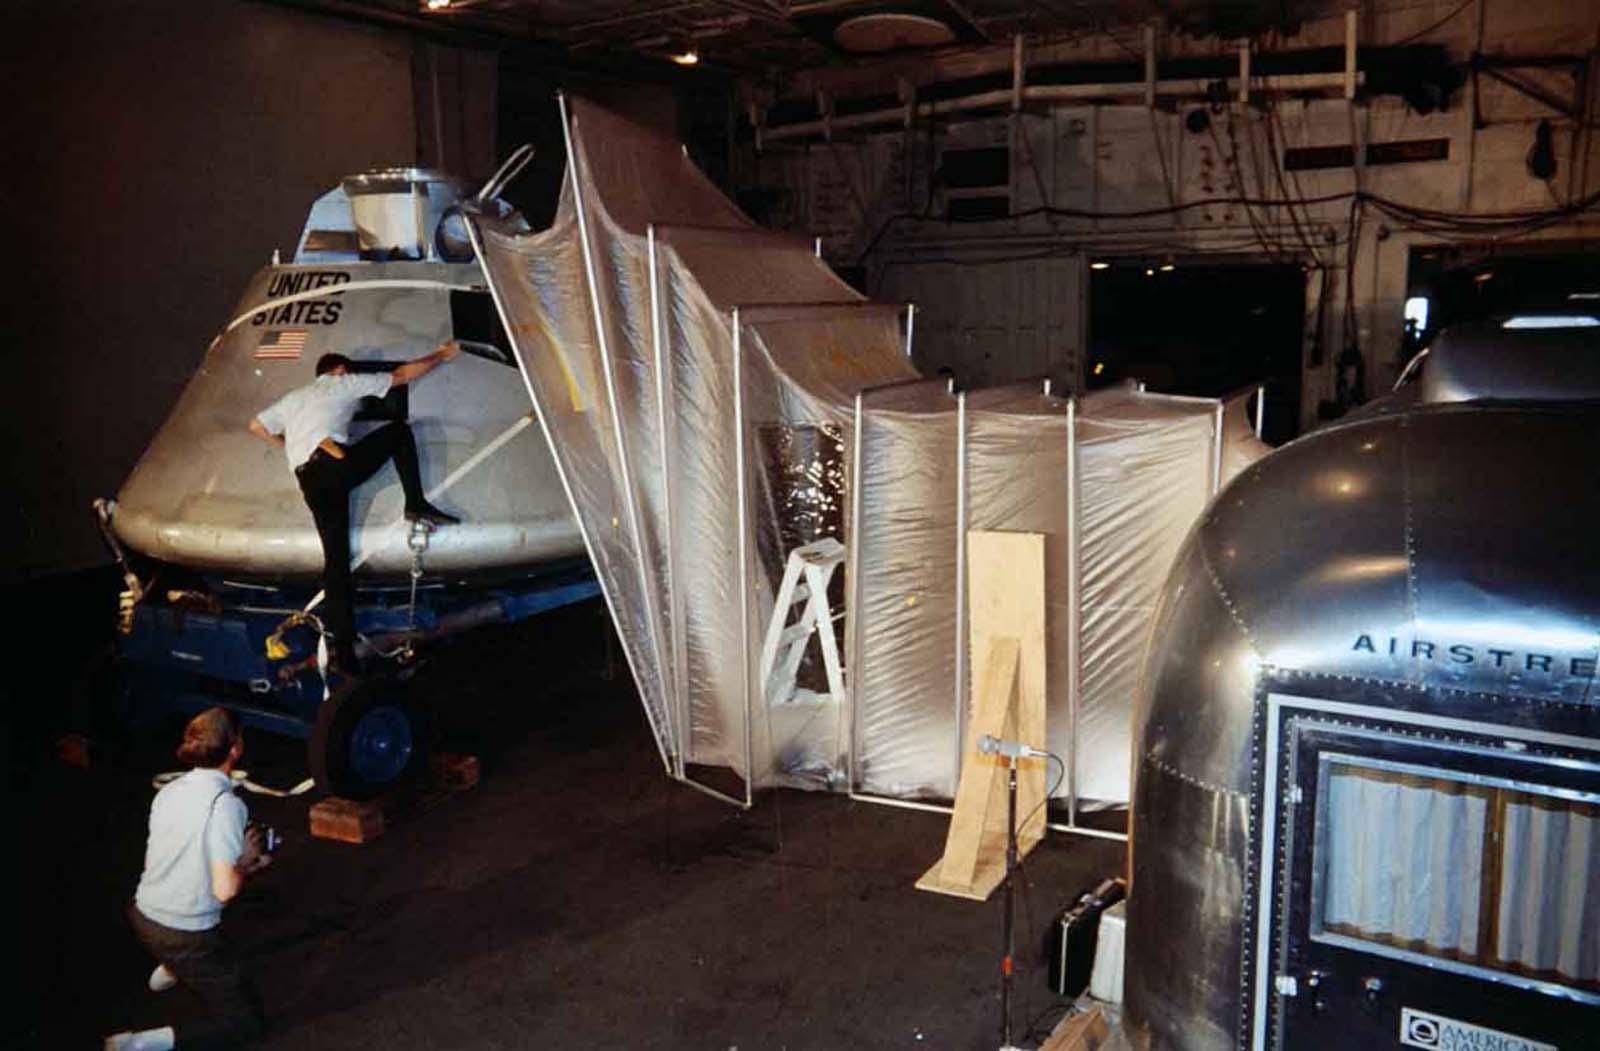 Man climbing at the Apollo Command Module inside the Mobile Quarantine Facility.